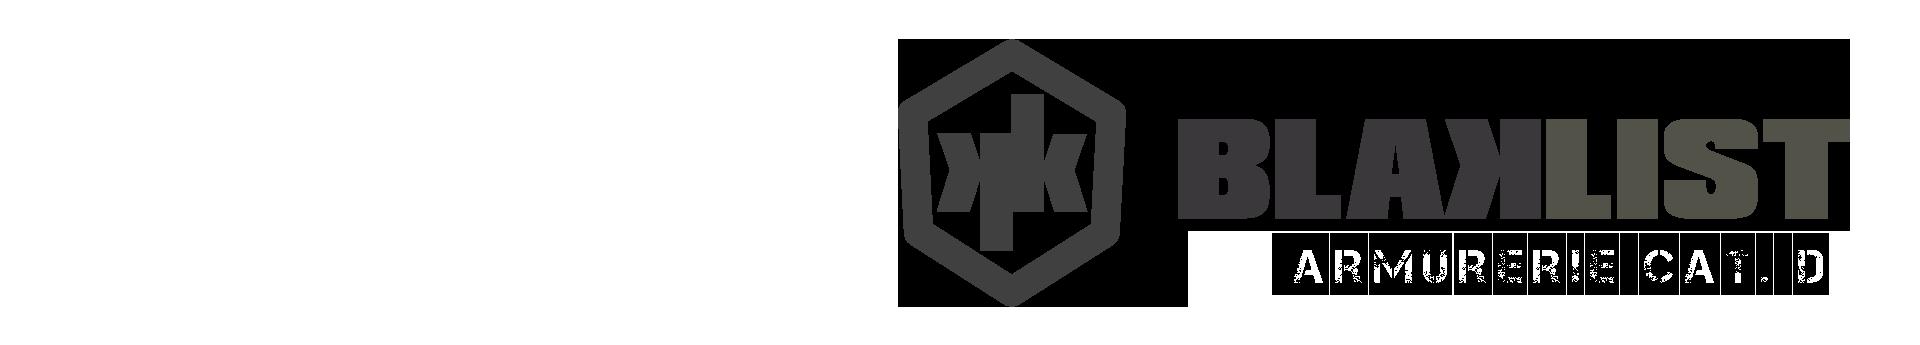 logo armurerie